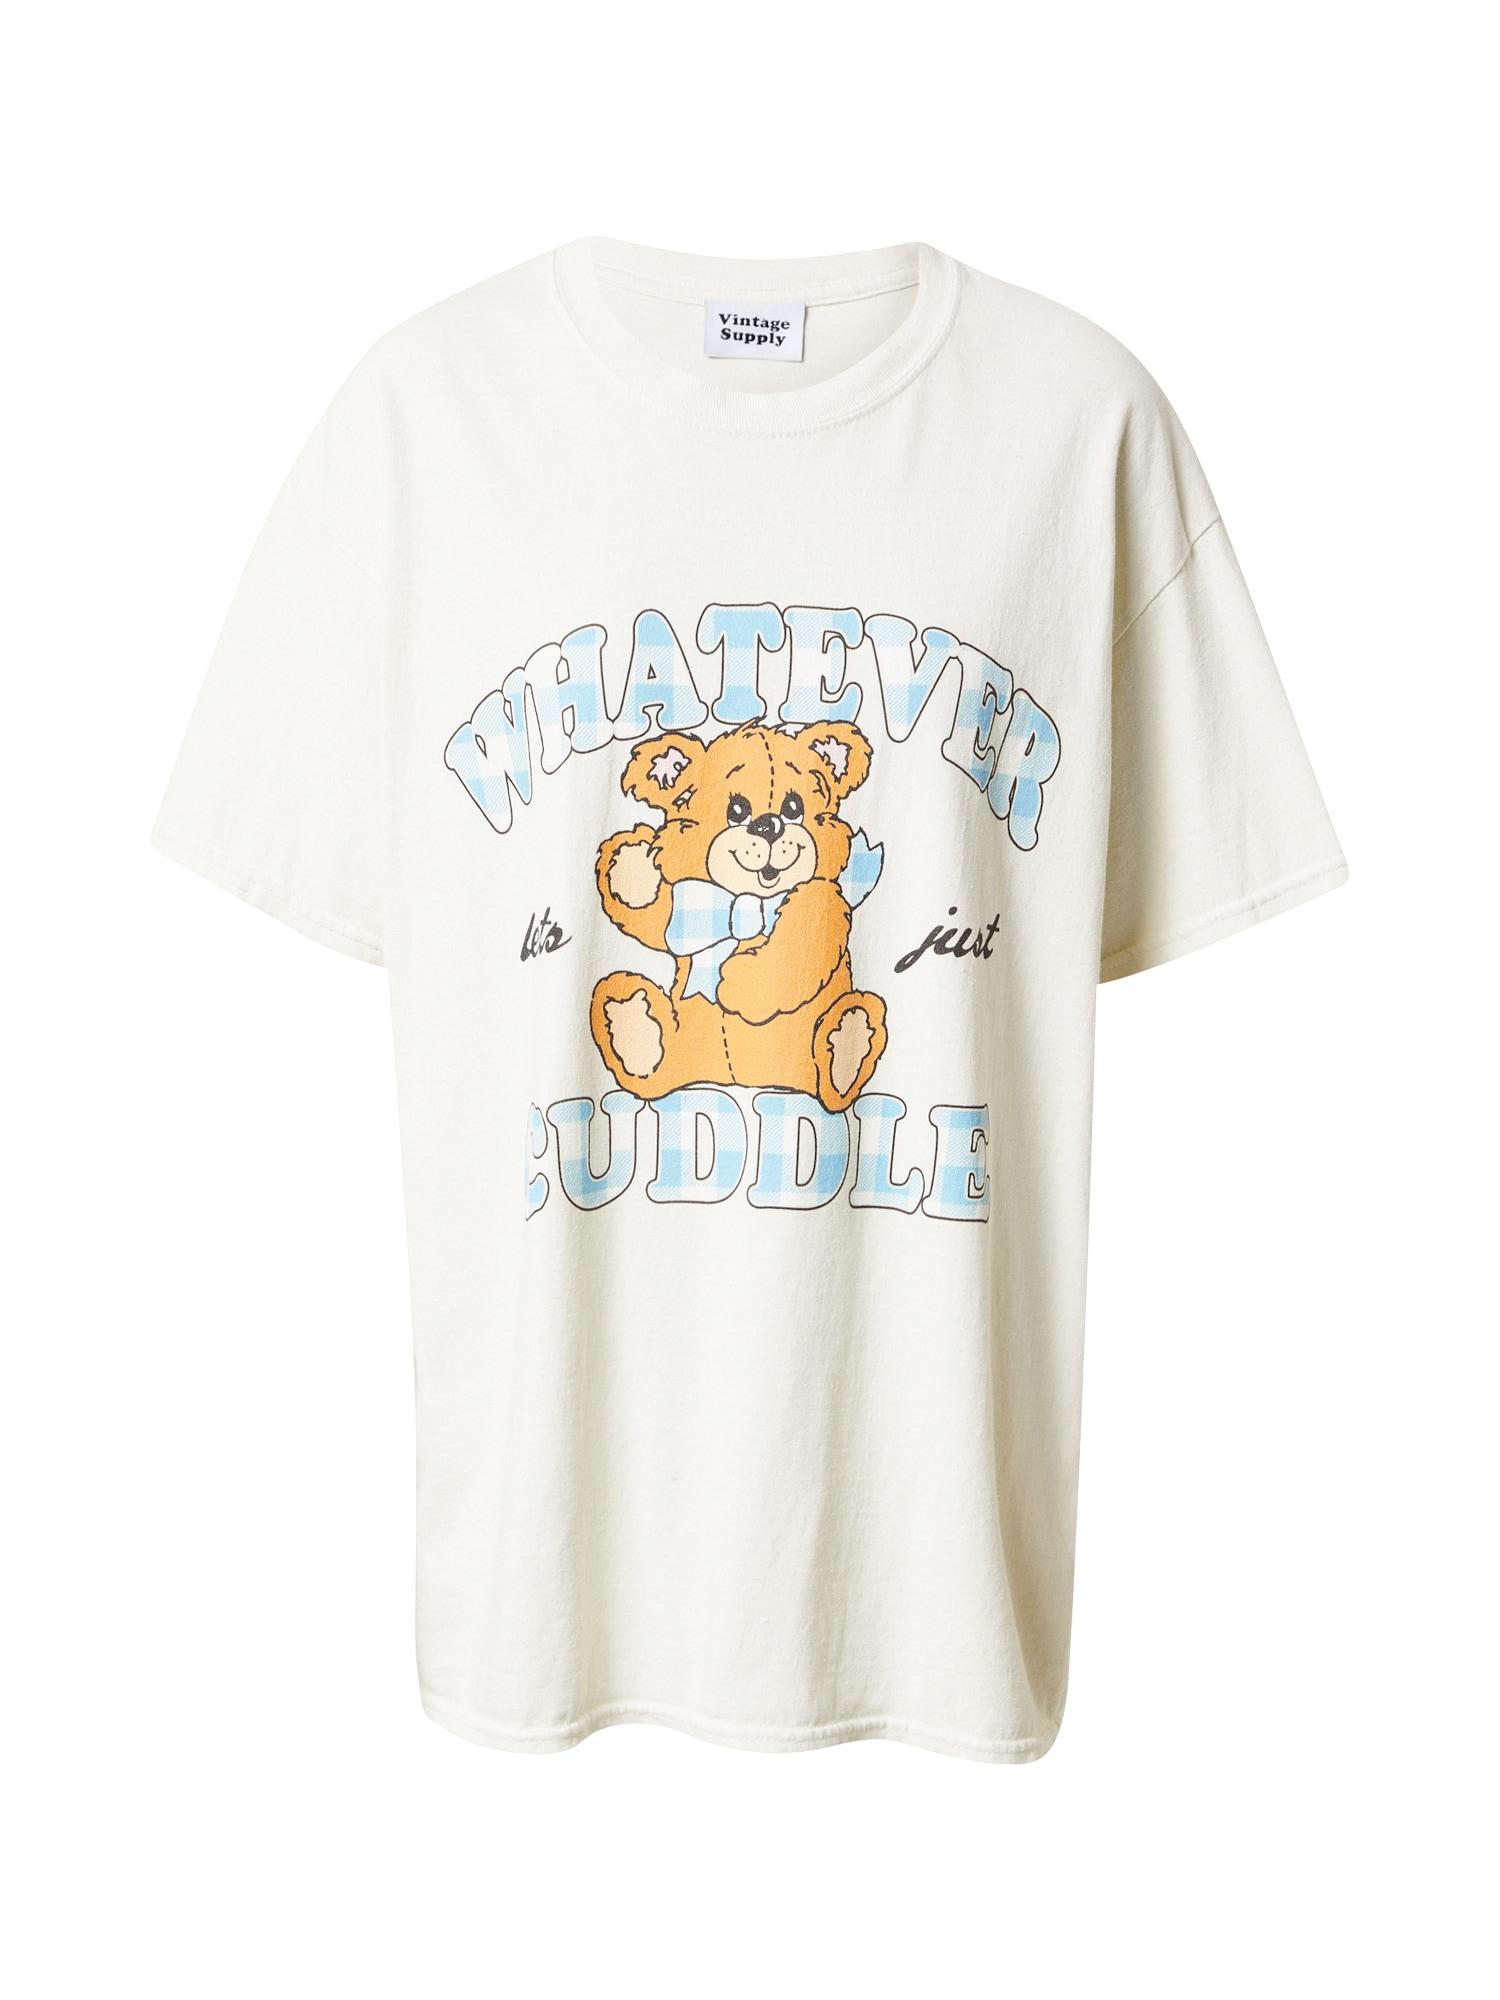 Vintage Supply Tričko  bílá / béžová / světlemodrá